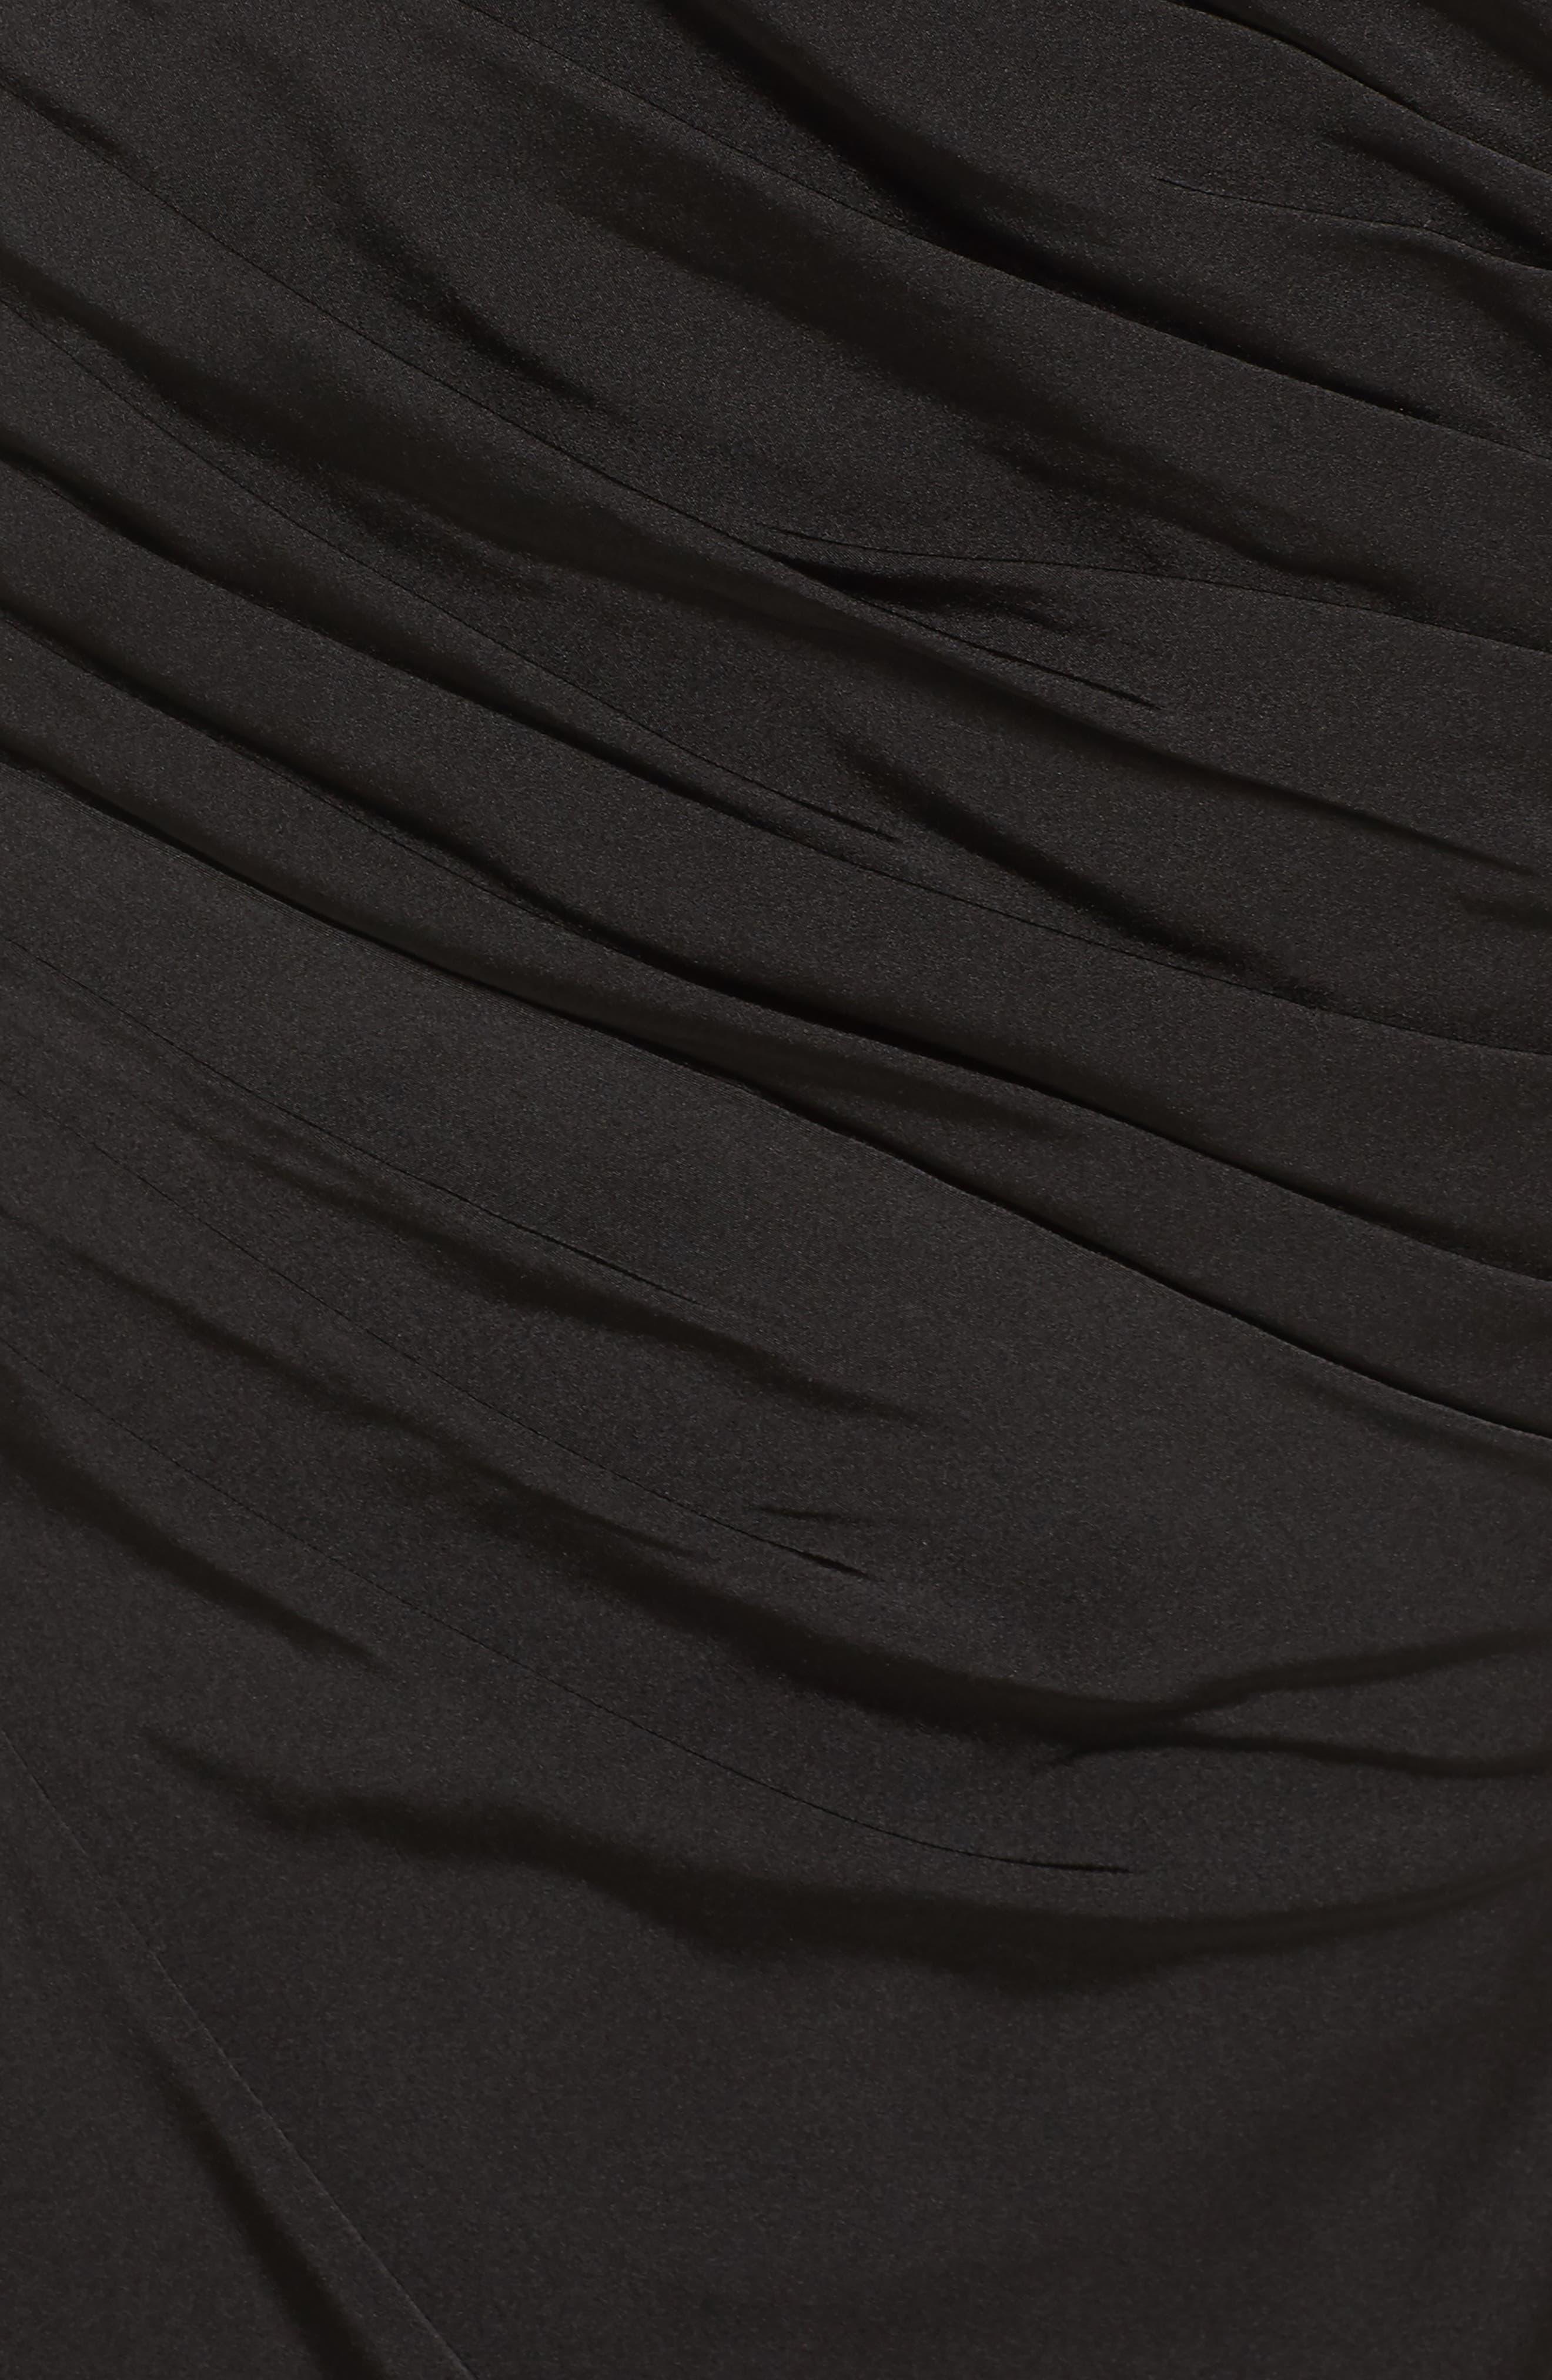 LA FEMME, Sheer Sleeve Gown, Alternate thumbnail 5, color, BLACK